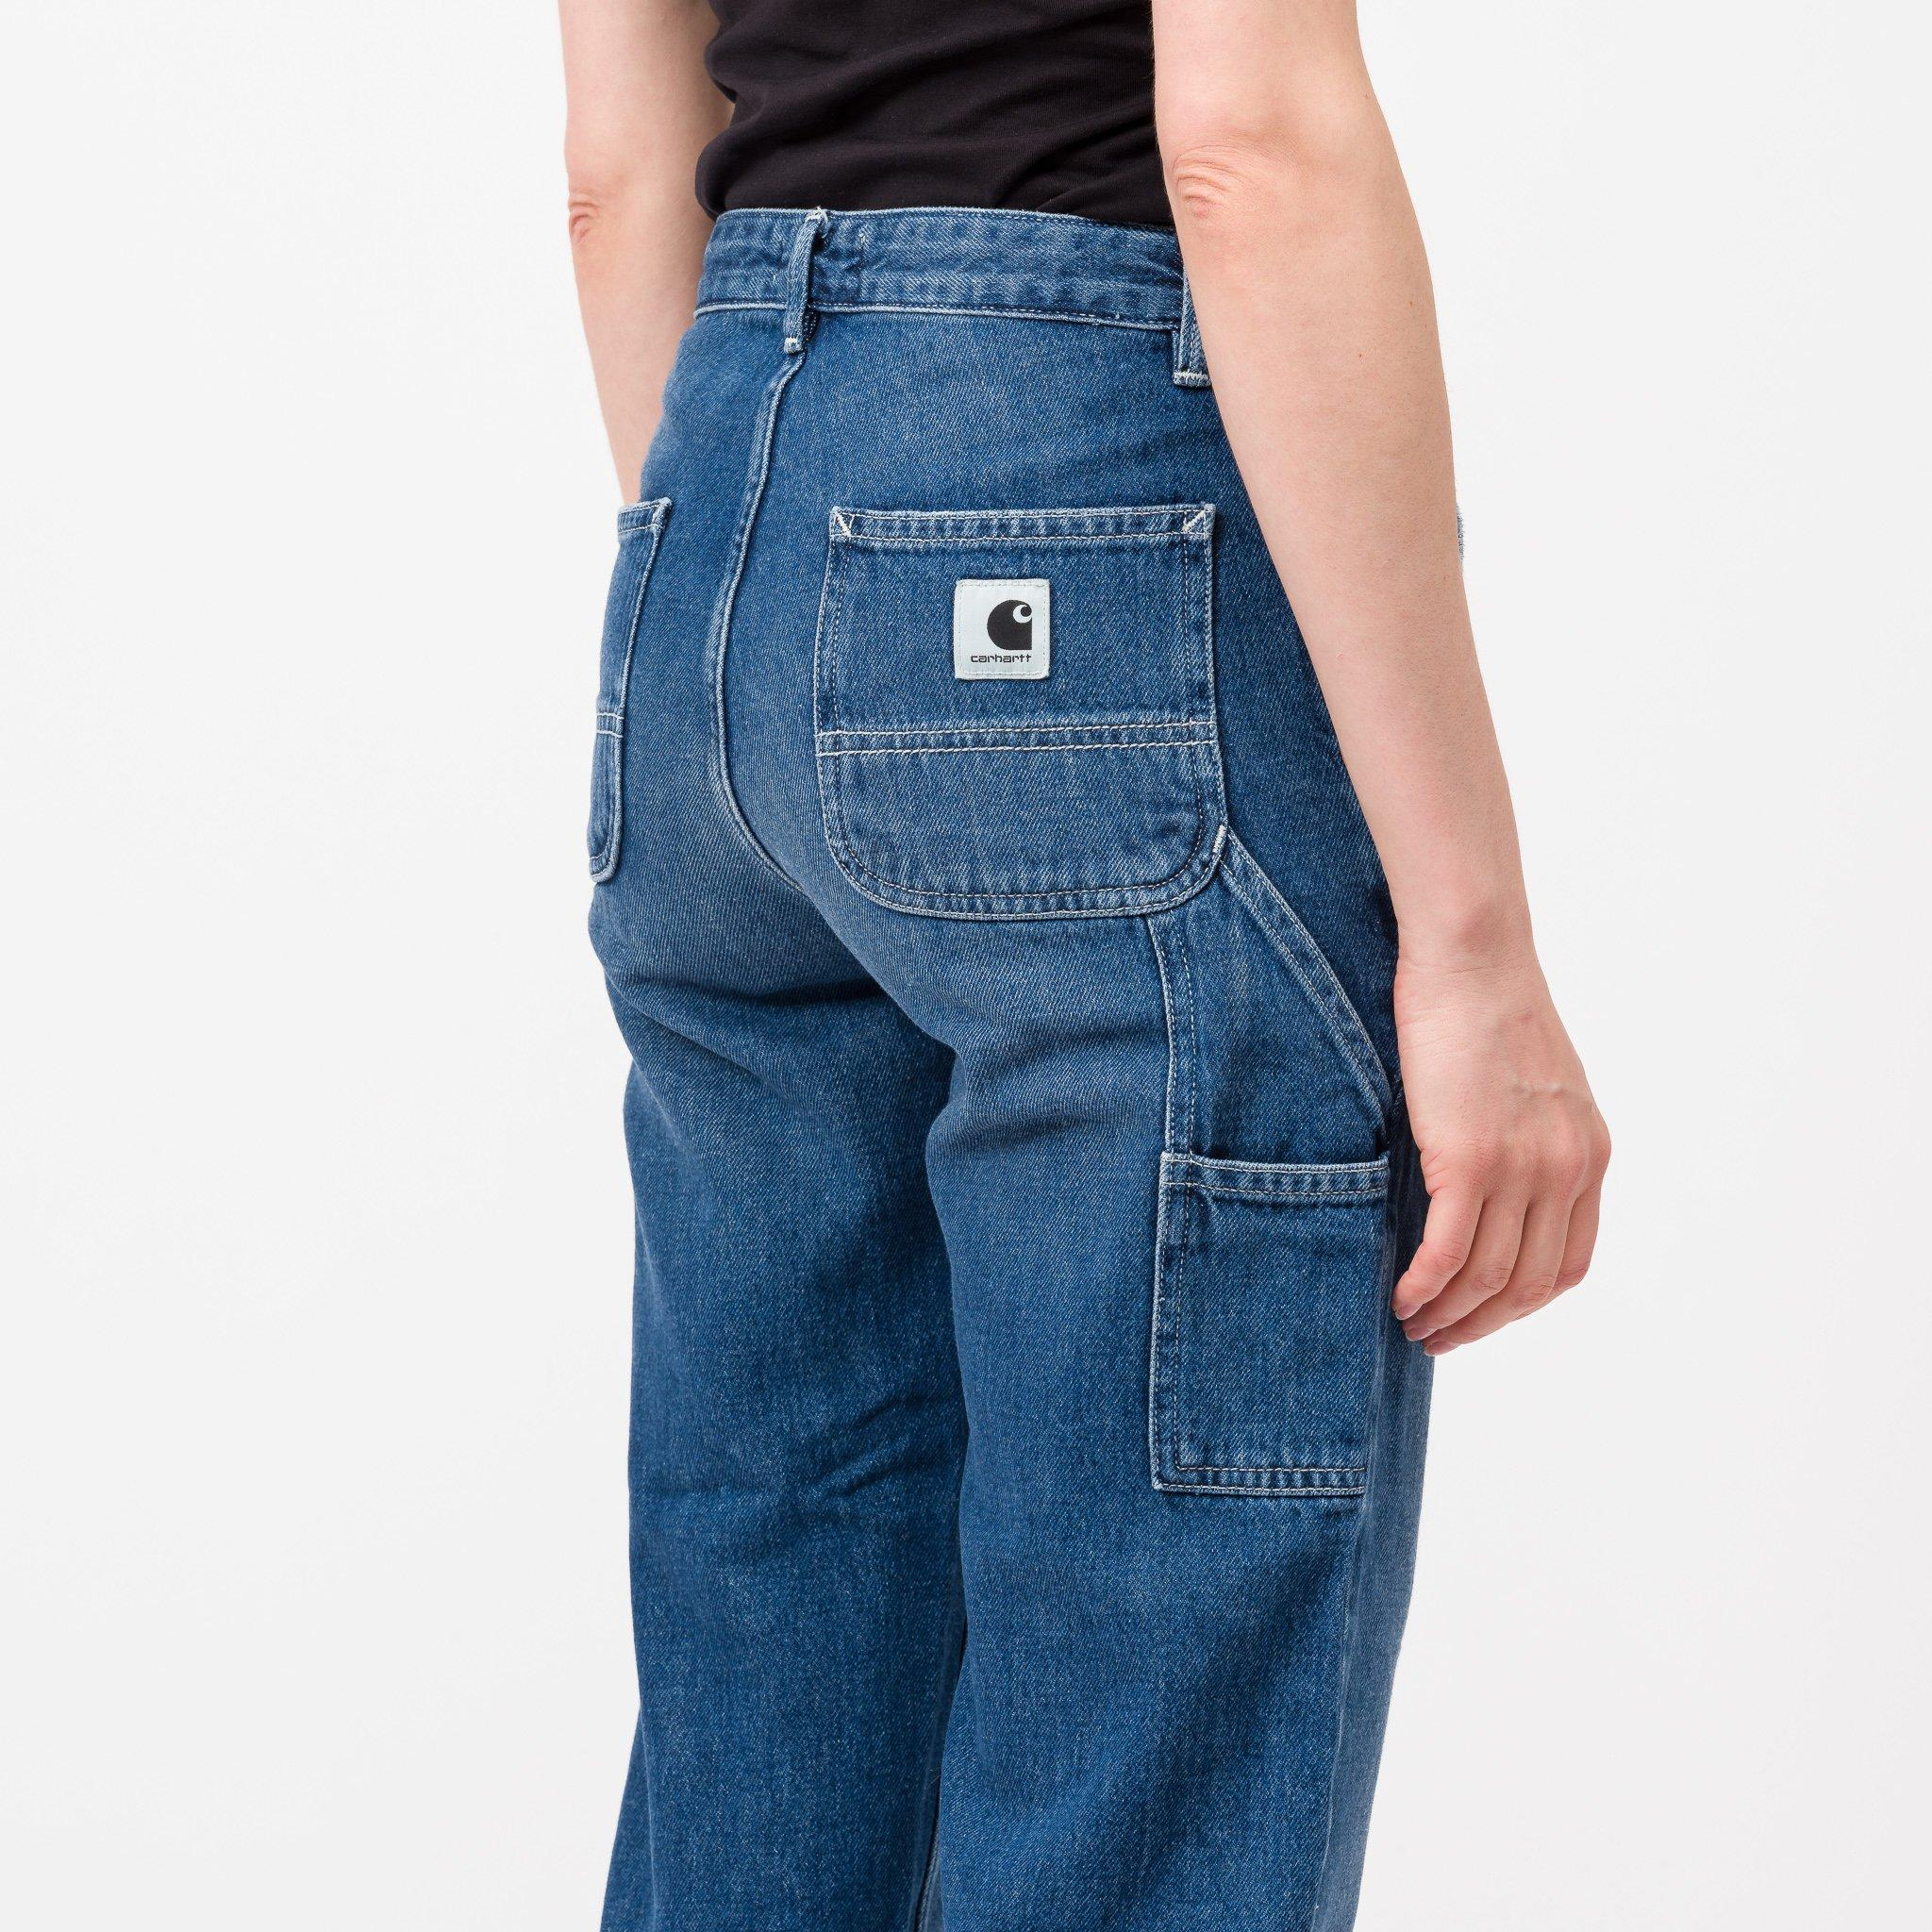 Carhartt WIP Jeans Pierce Pant Blue Dark Stone Wash